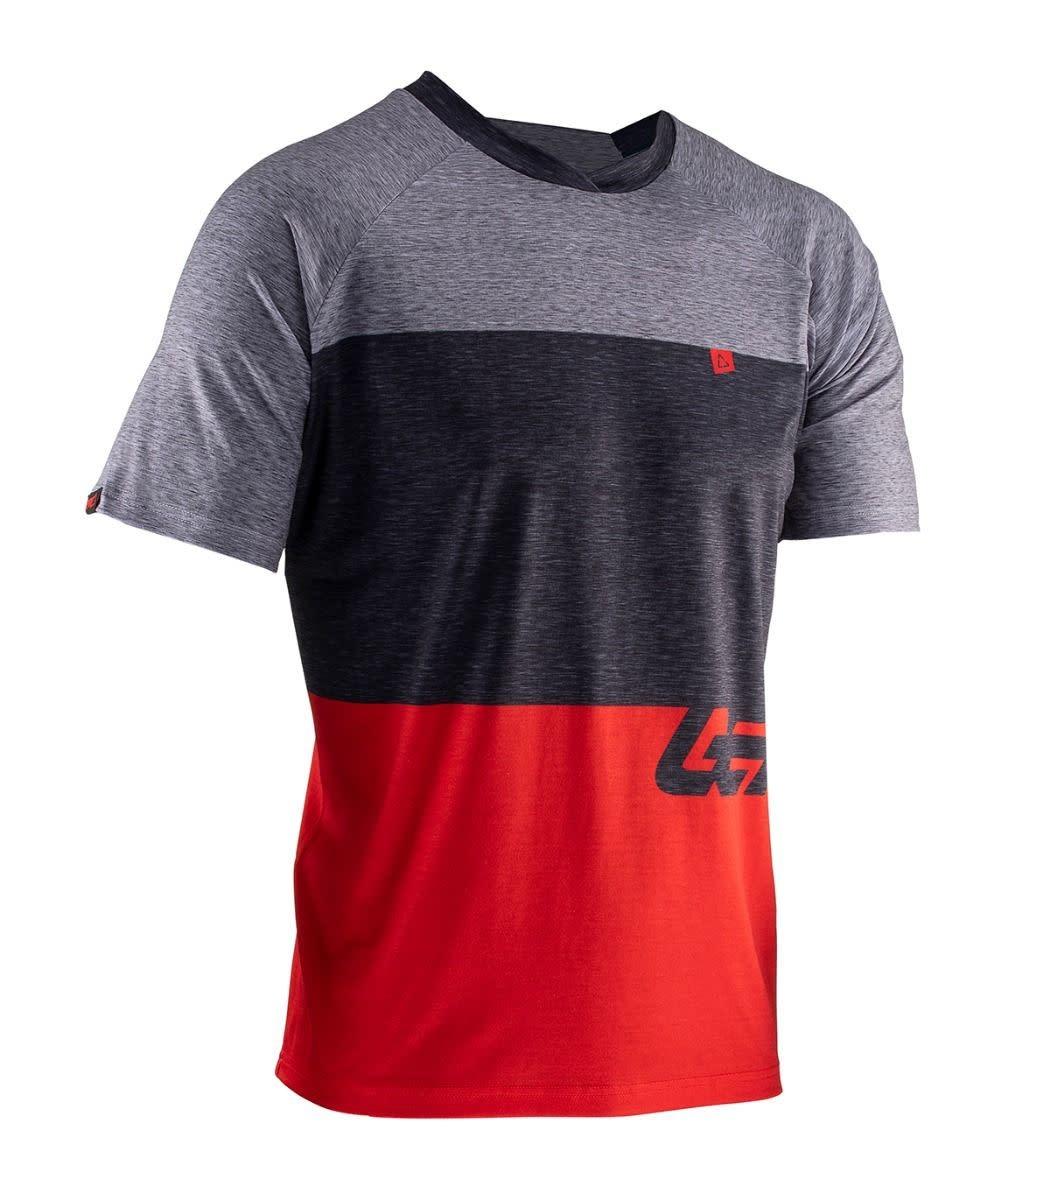 Leatt Leatt Jersey DBX 2.0 #L Red